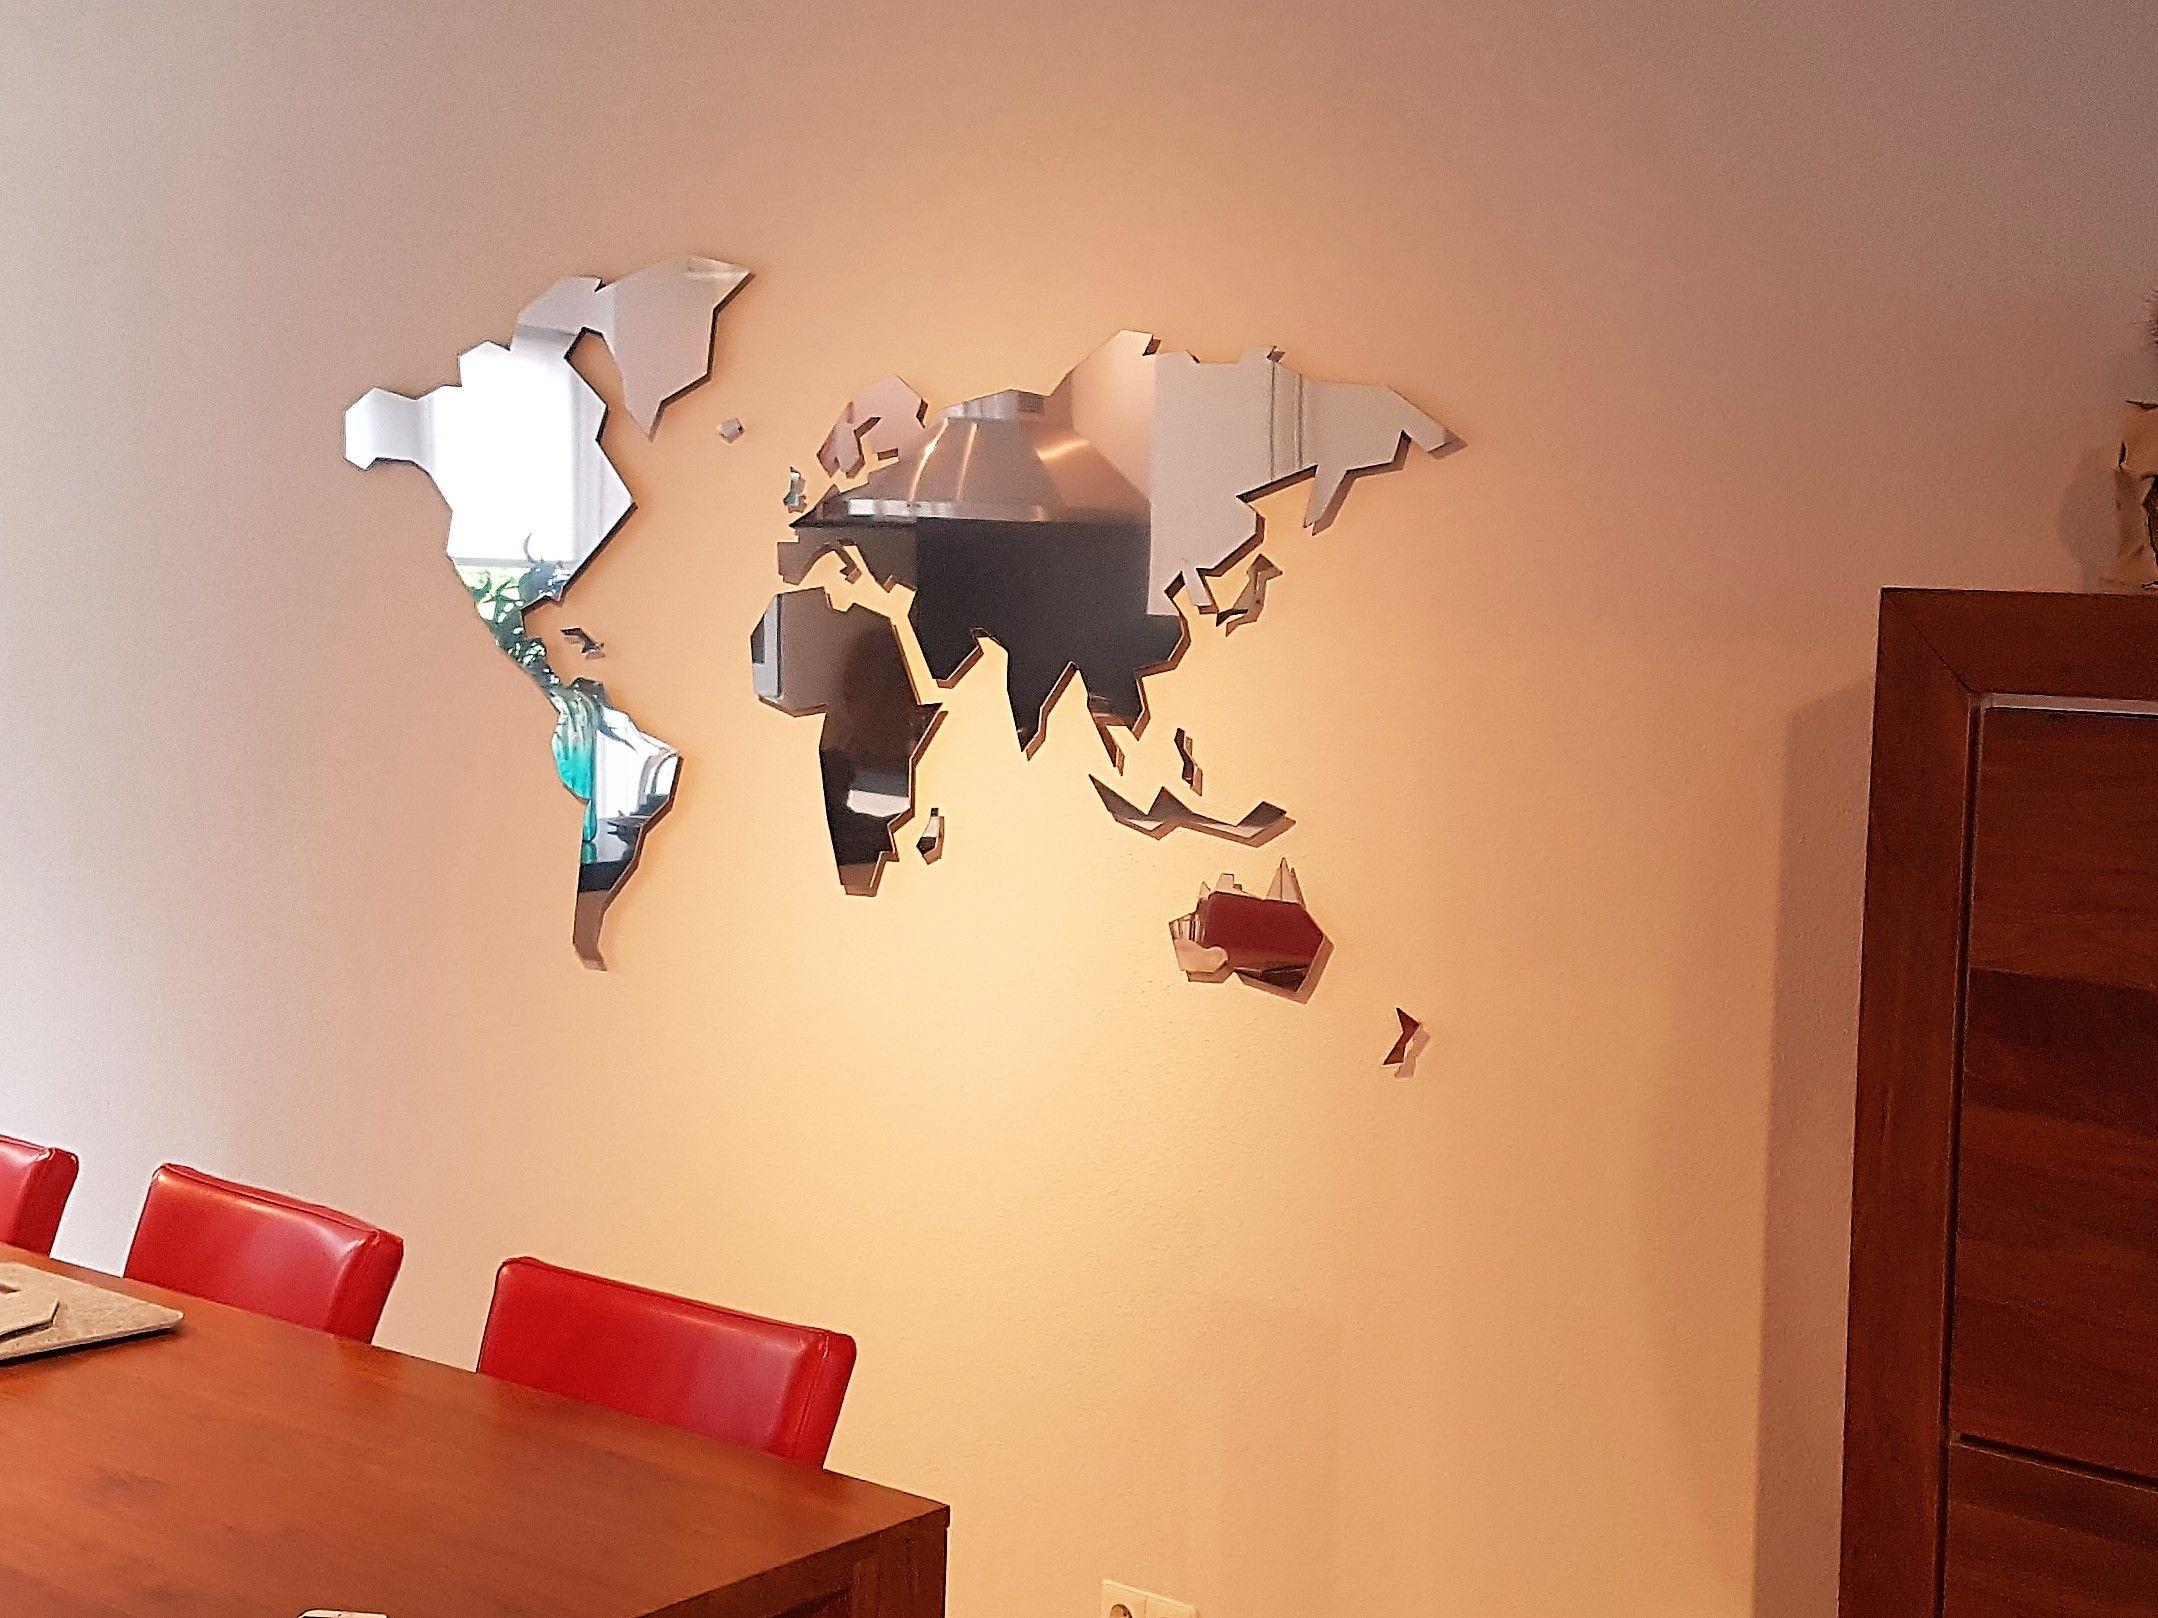 geomundi wereldkaart world map jazz dessin many formats heated and geomundi wereldkaart world map jazz dessin many formats heated and curved homemade atelier peter sprengers pinterest atelier